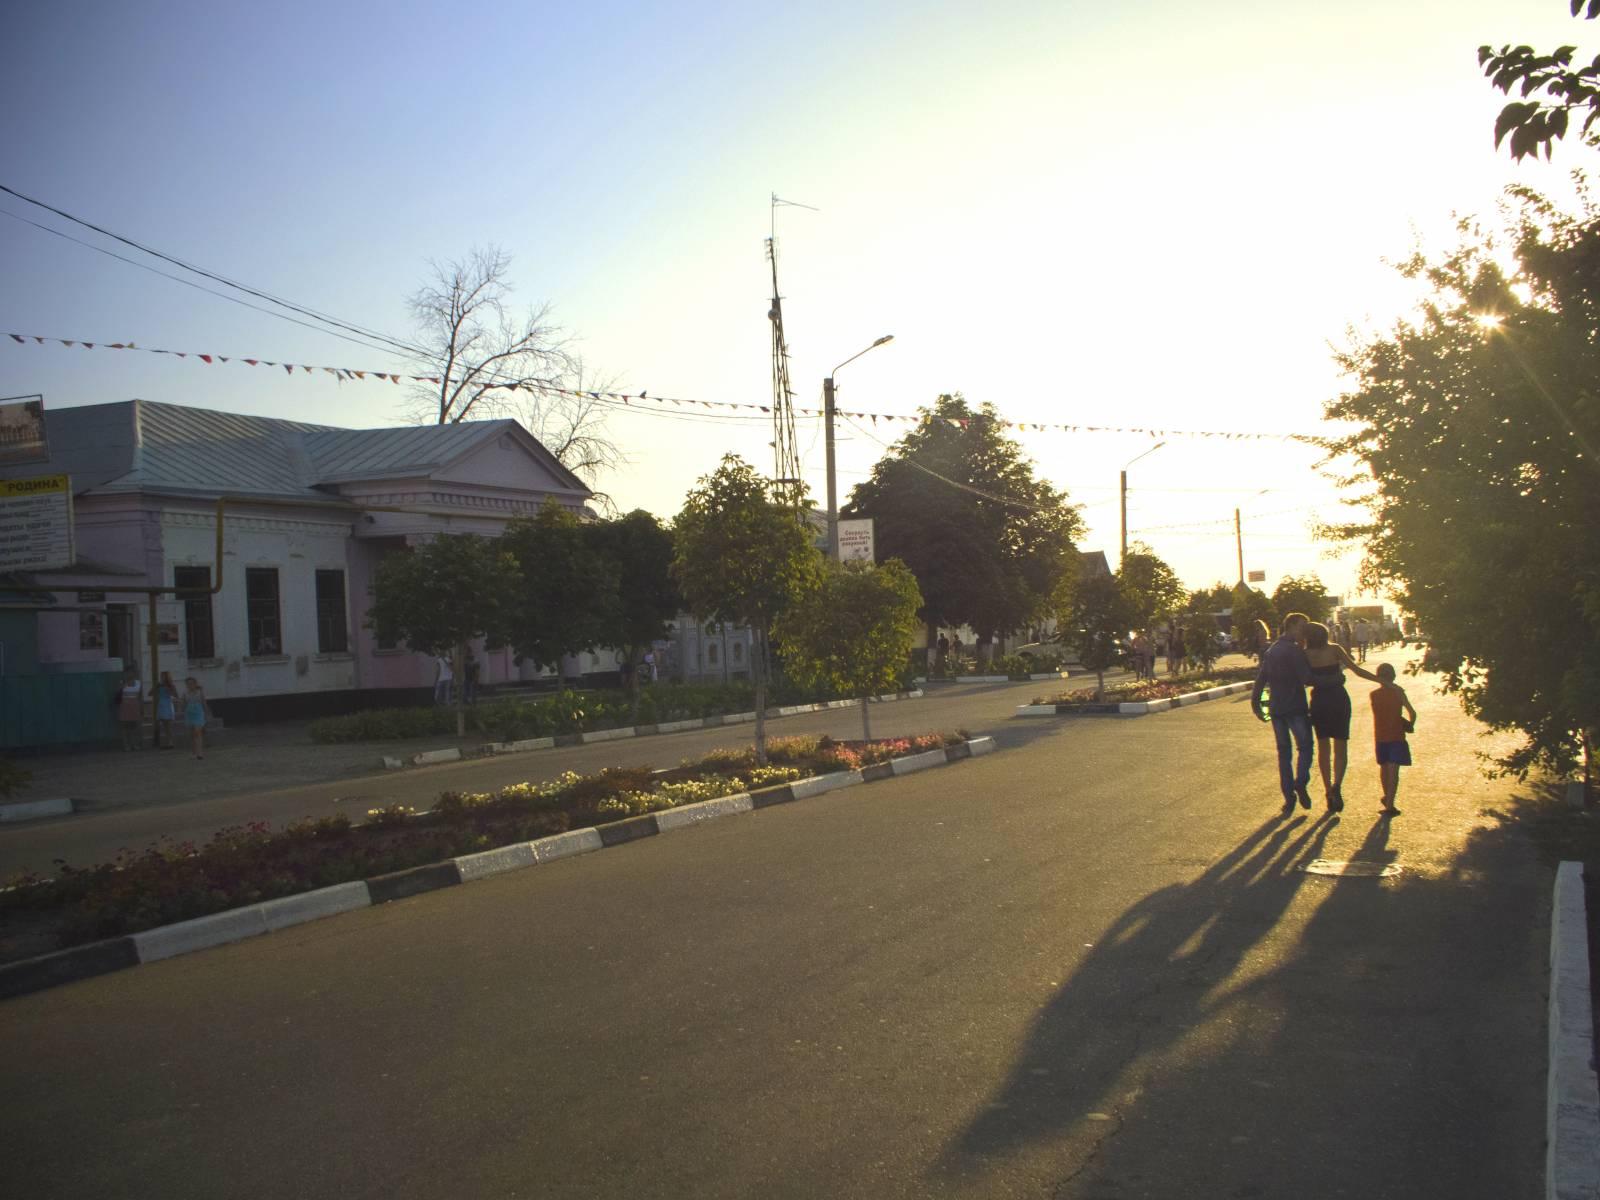 Закат на ул. 50 лет октября в Приморско-Ахтарске